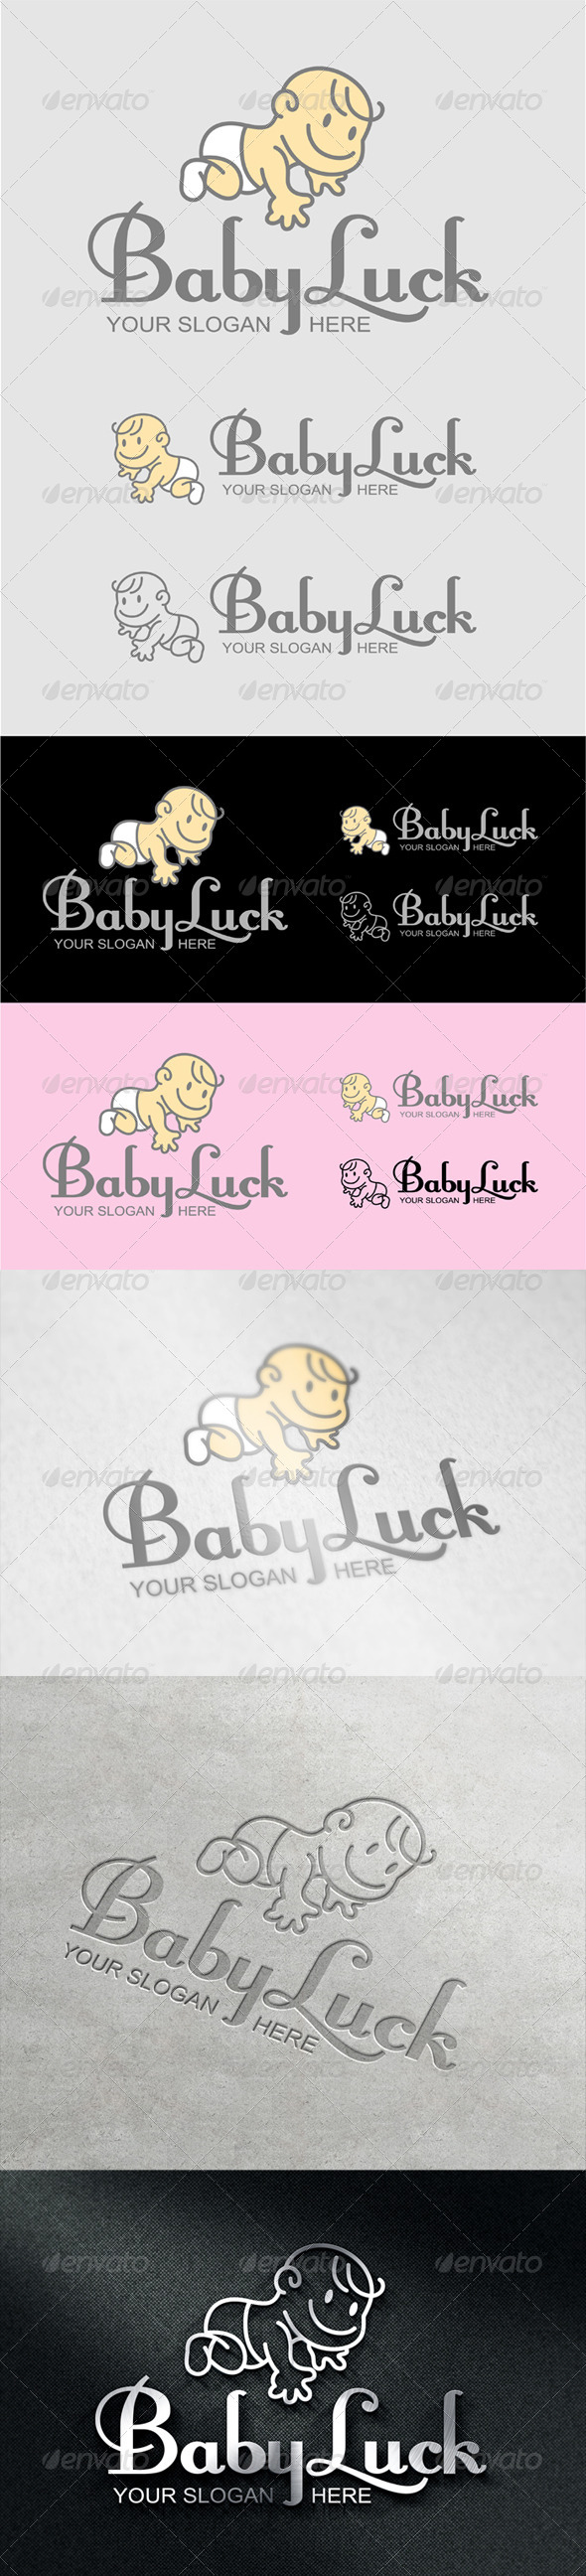 GraphicRiver BabyLuck Logo 7064595